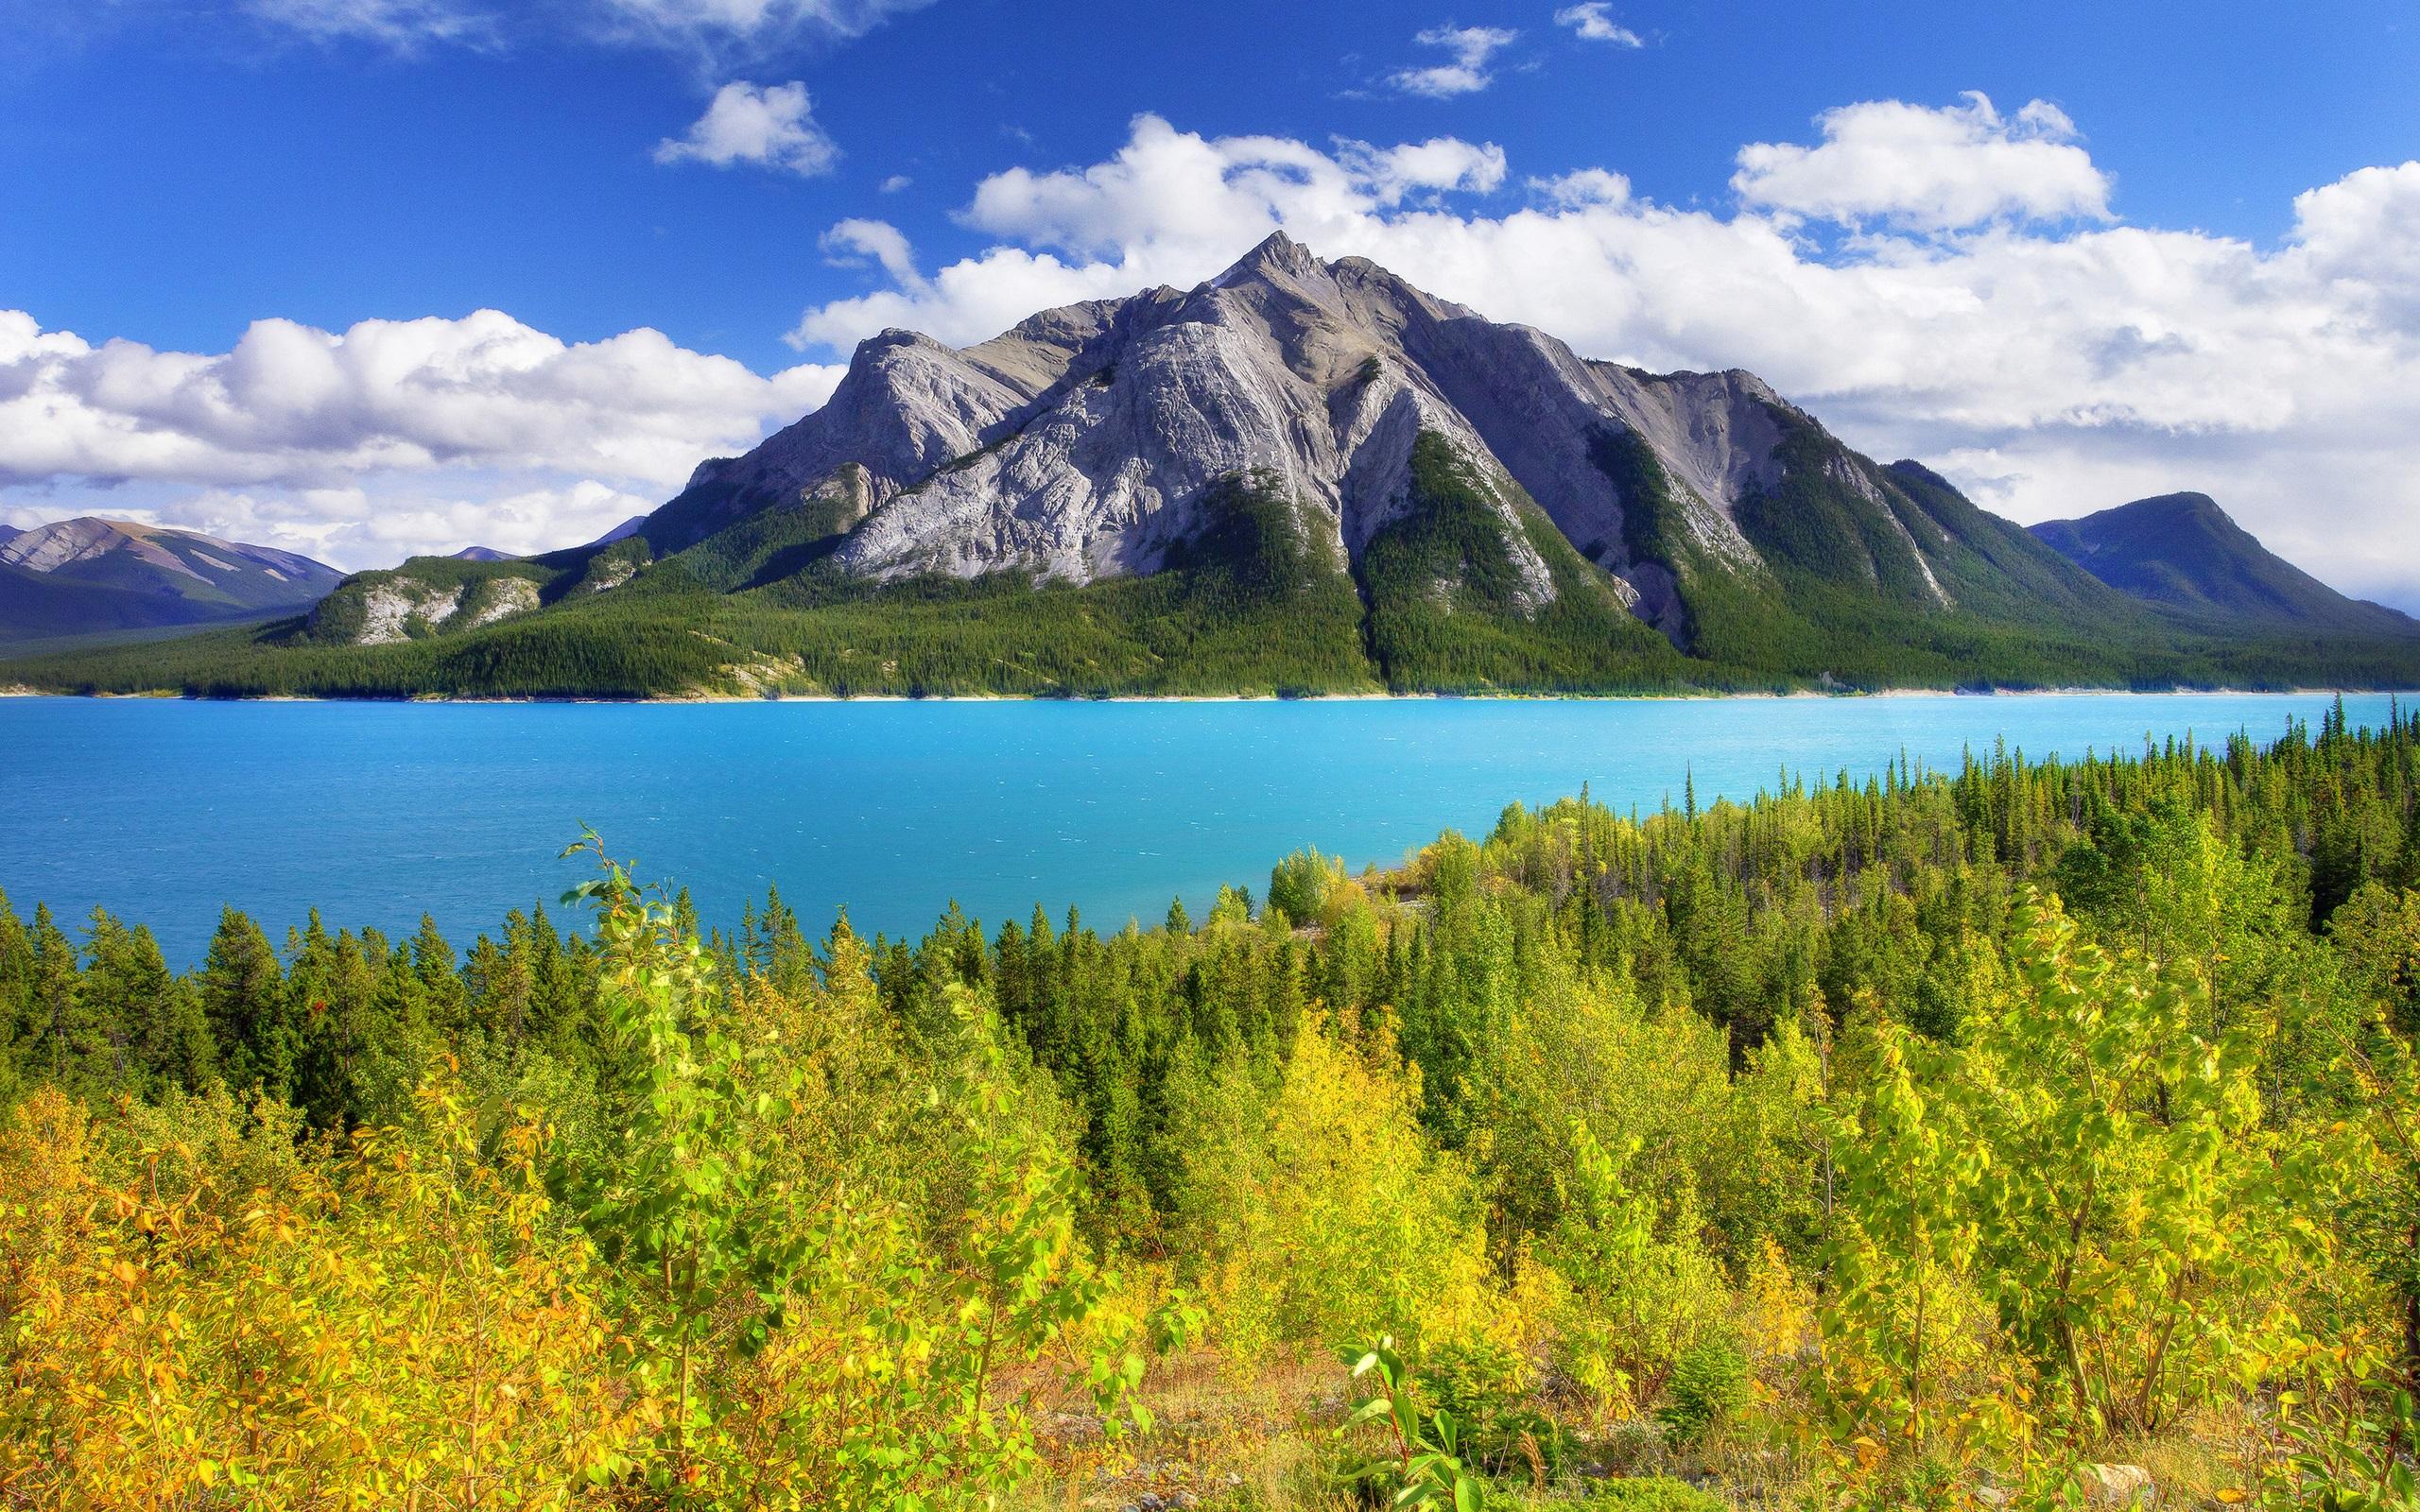 Wallpaper Abraham Lake Banff Park Alberta Canada sky mountain 2560x1600